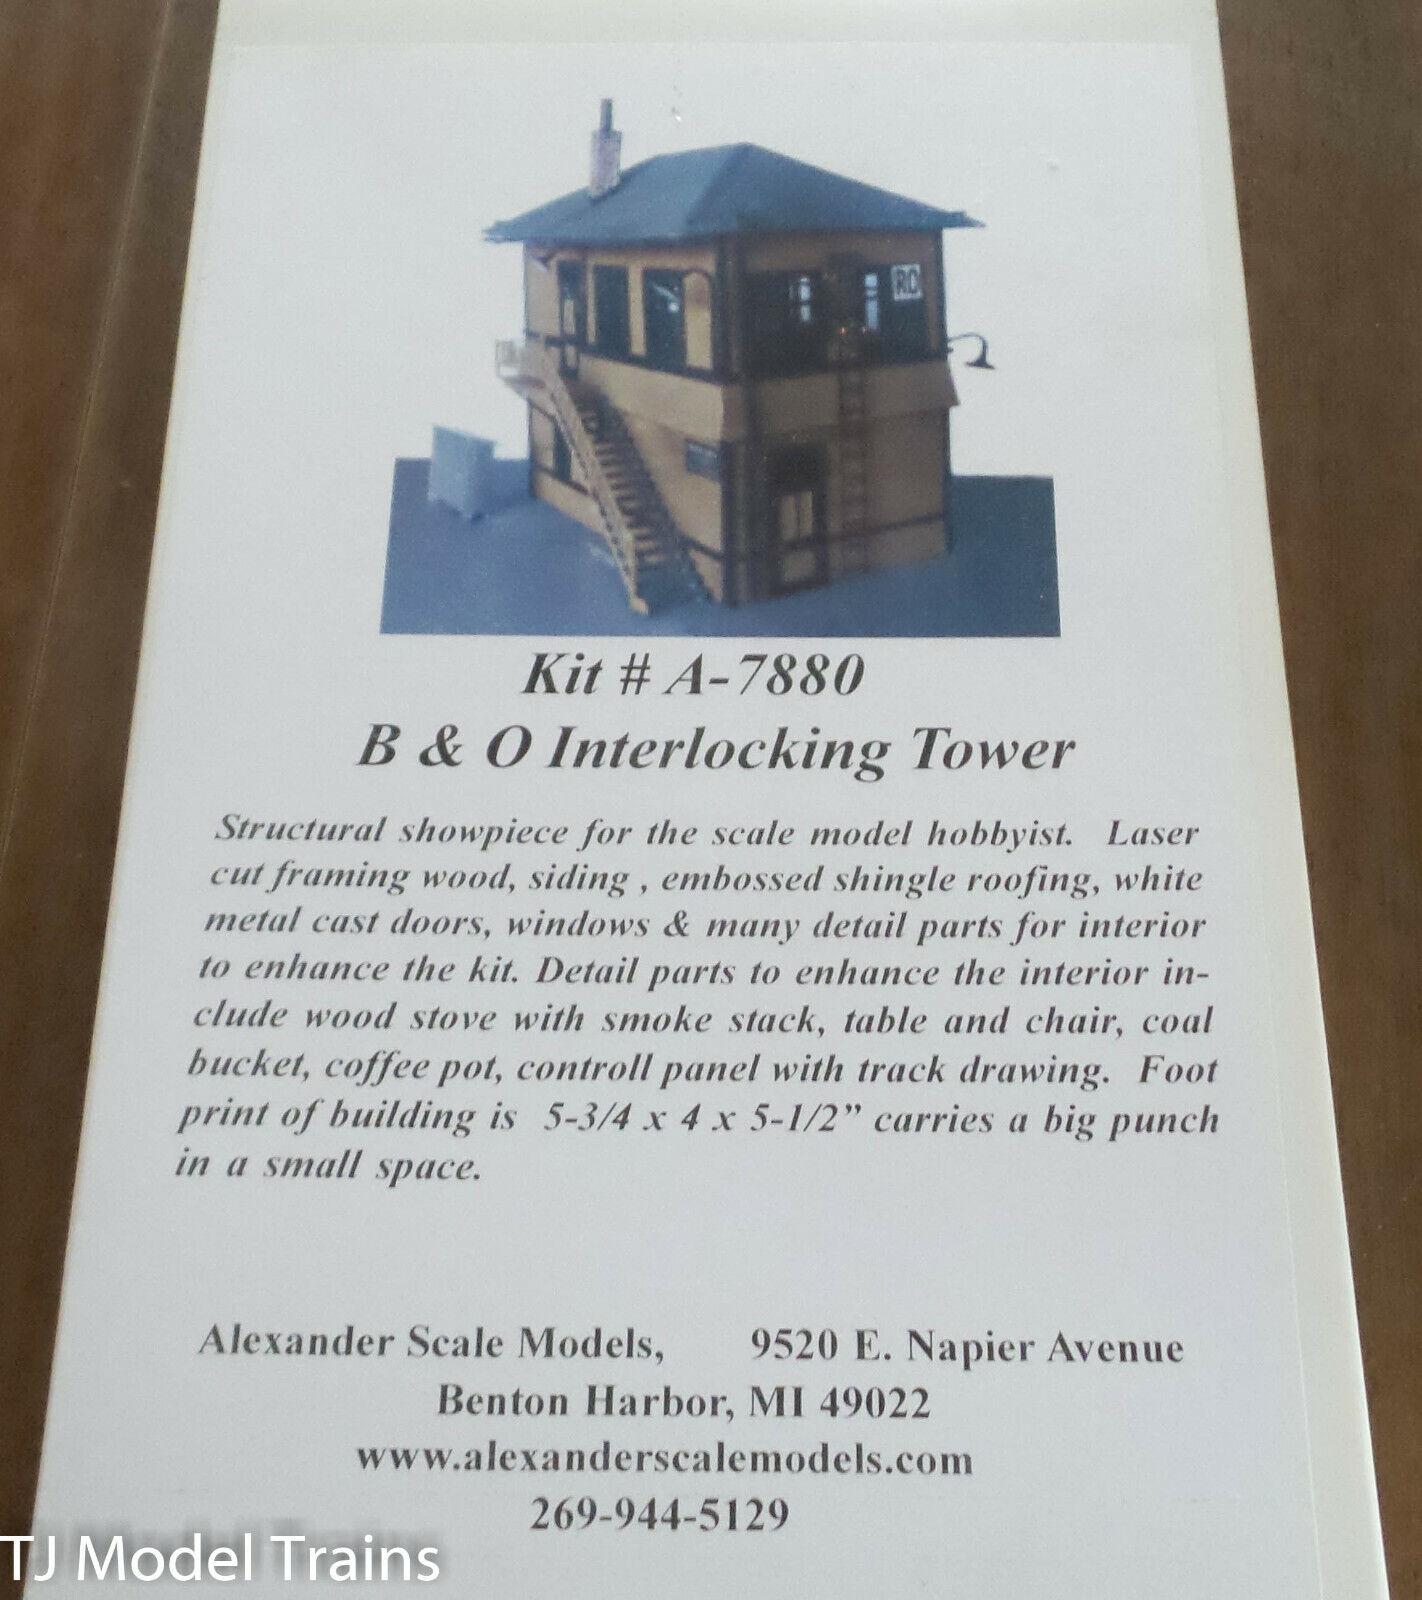 autorización Alexander Escala Ho  A-7880 A-7880 A-7880 B & O Torre de enclavamiento  se descuenta